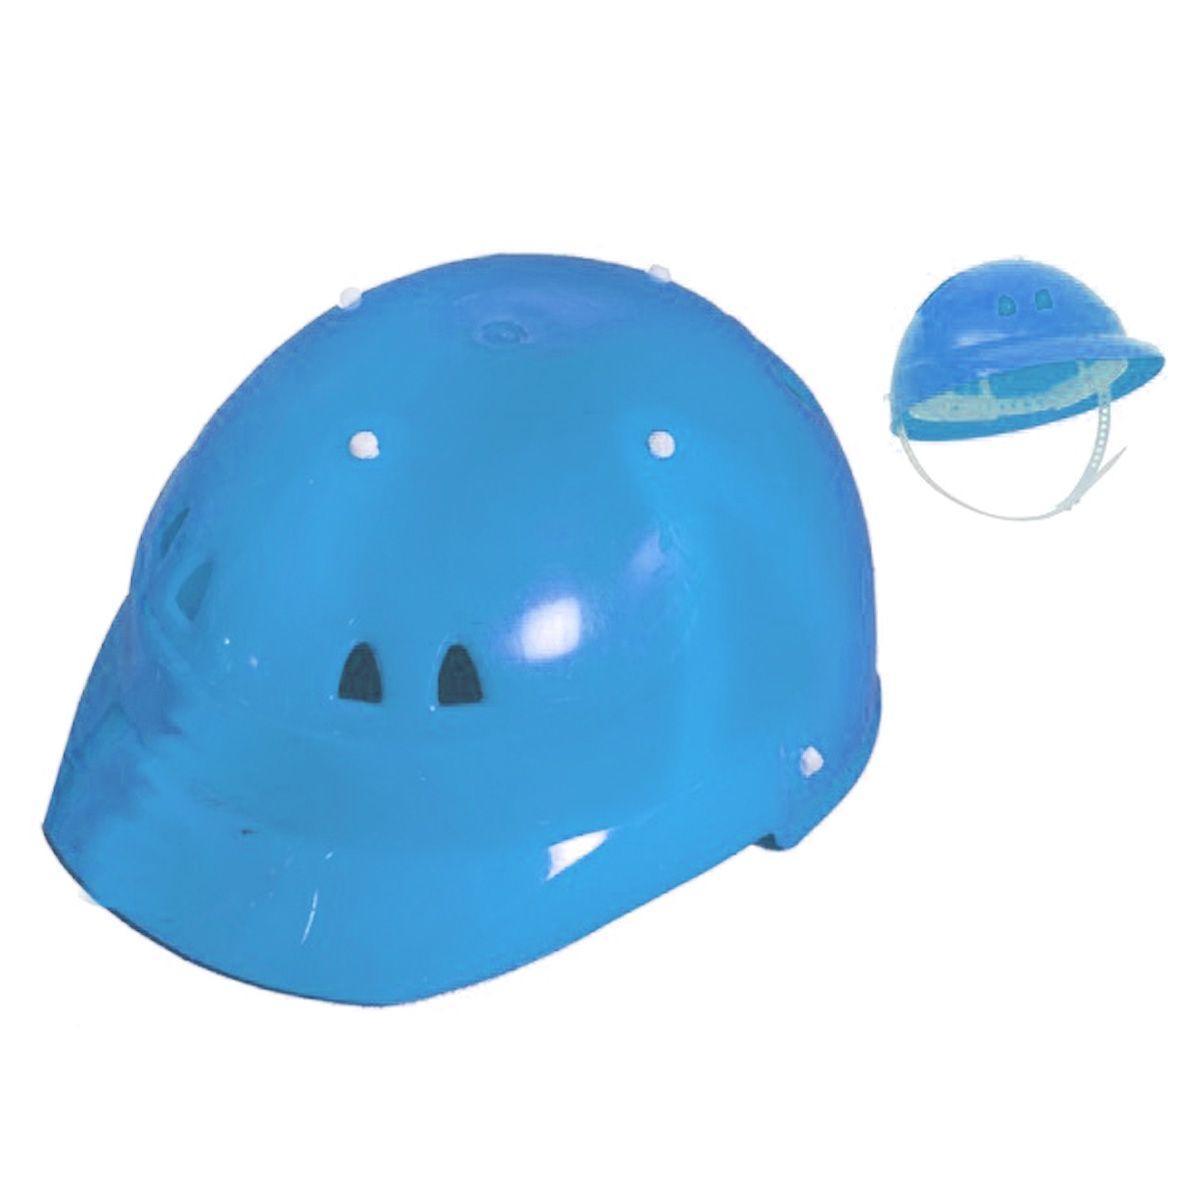 Каска Слесарь, голубой KW-31-020